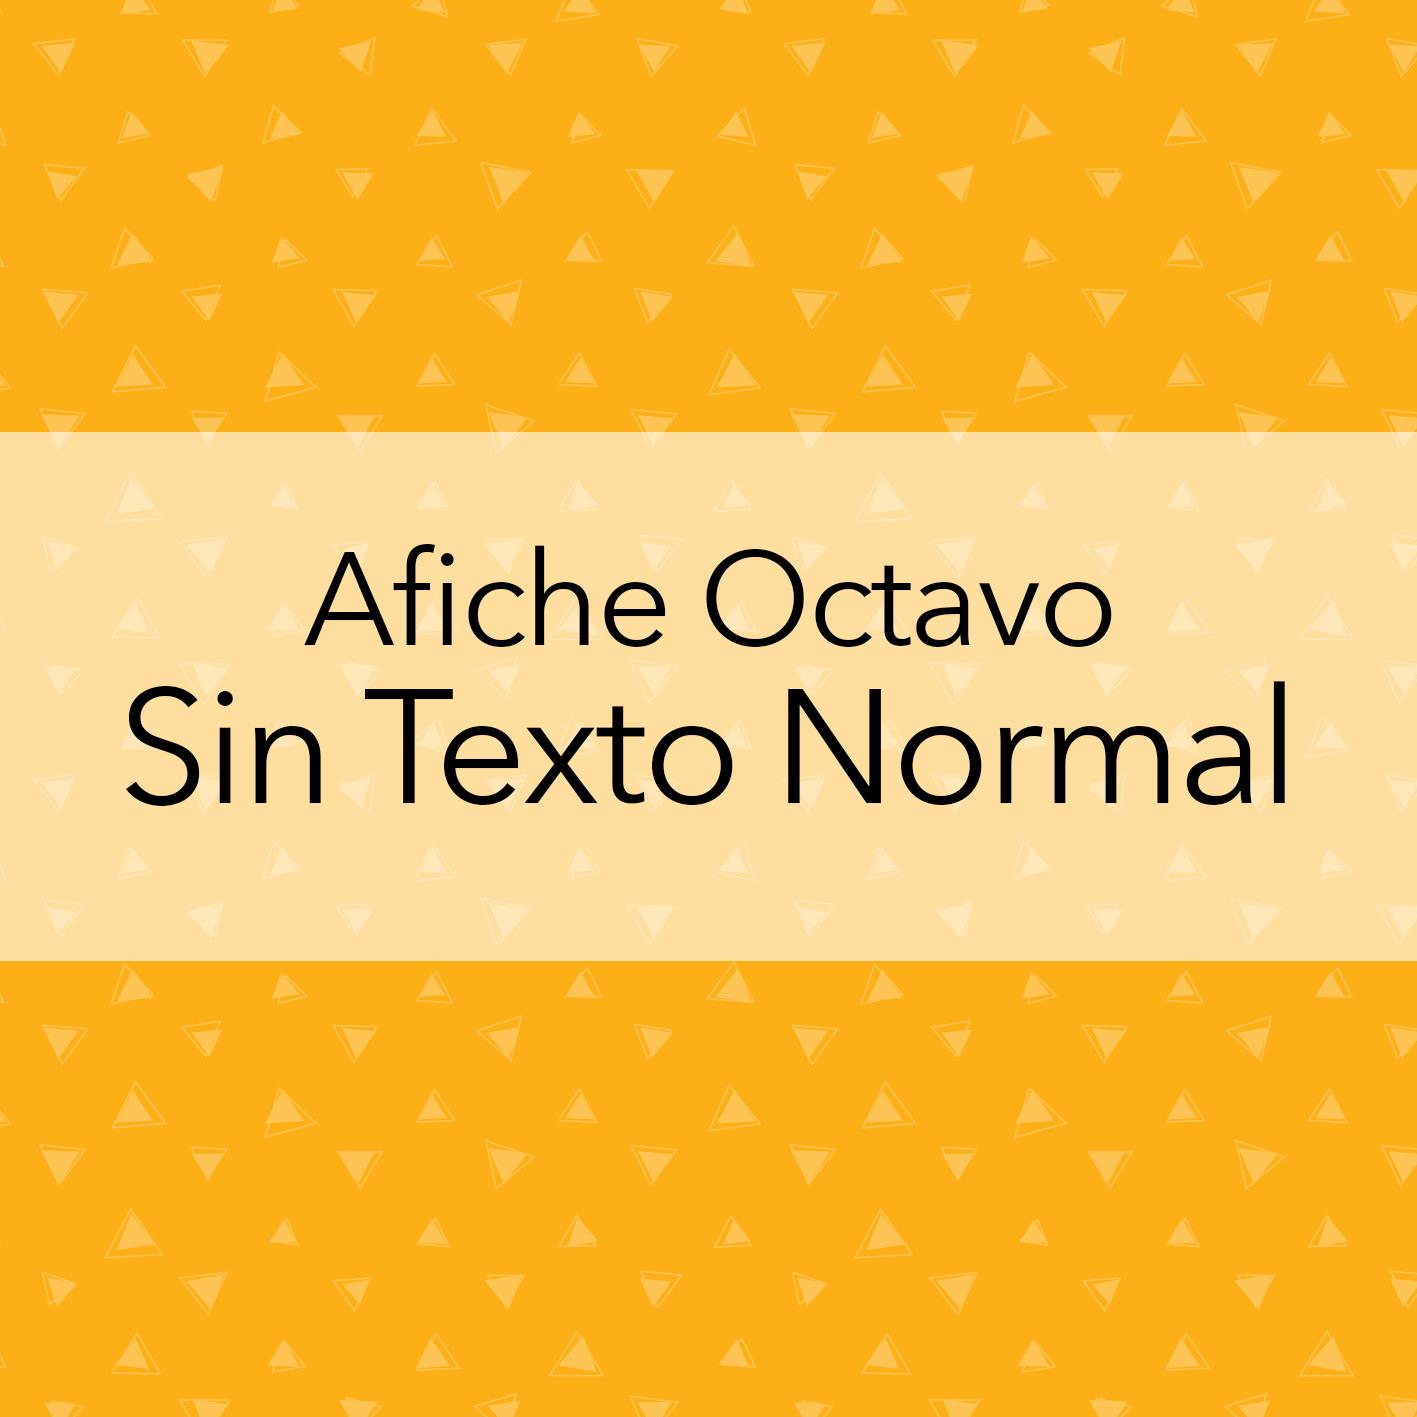 AFICHE OCTAVO SIN TEXTO NORMAL